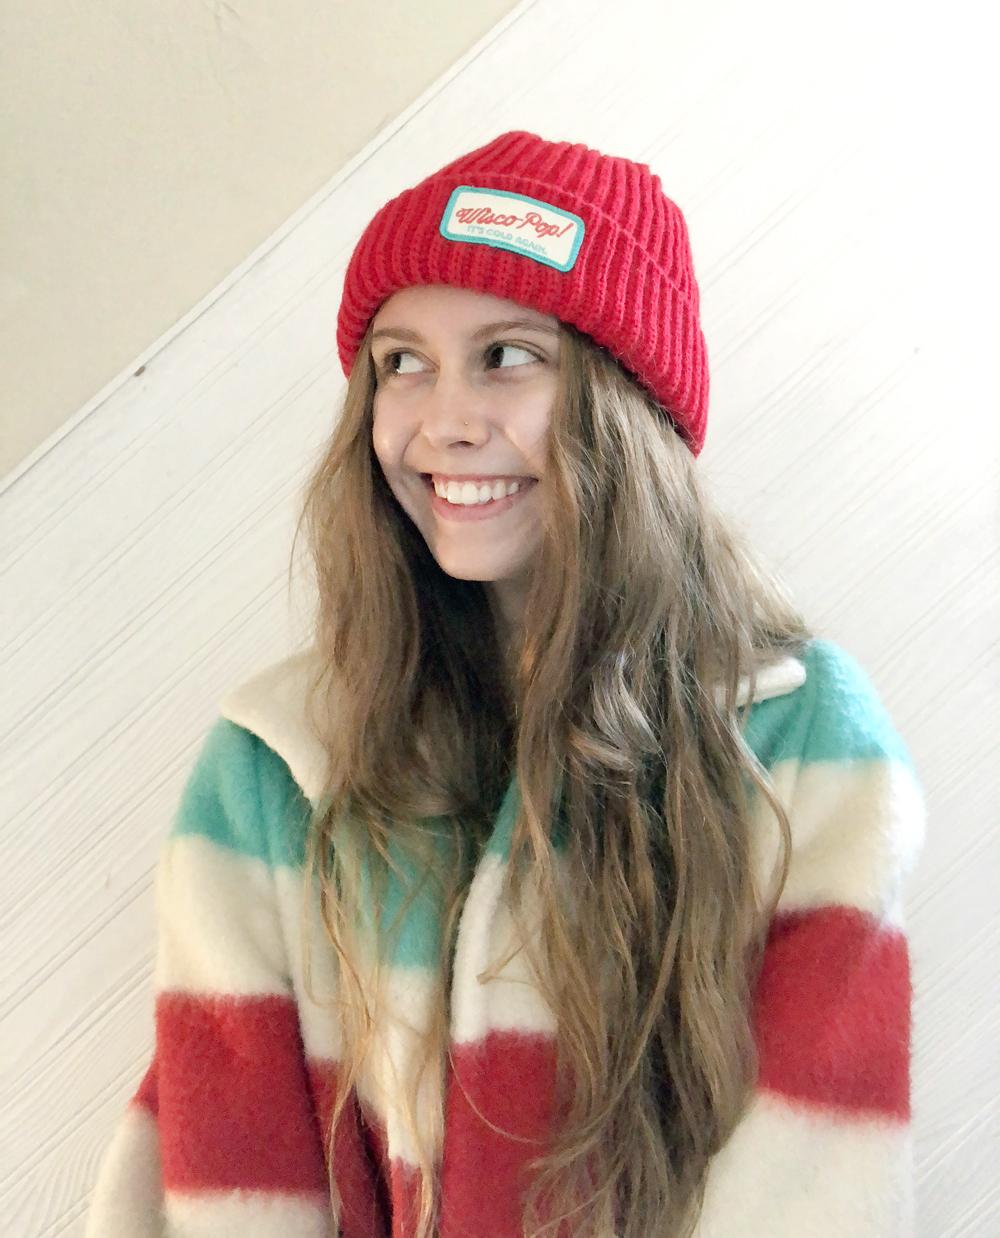 adcf9aa1741af Wisco Pop!  The Knit Hat — Wisco Pop!